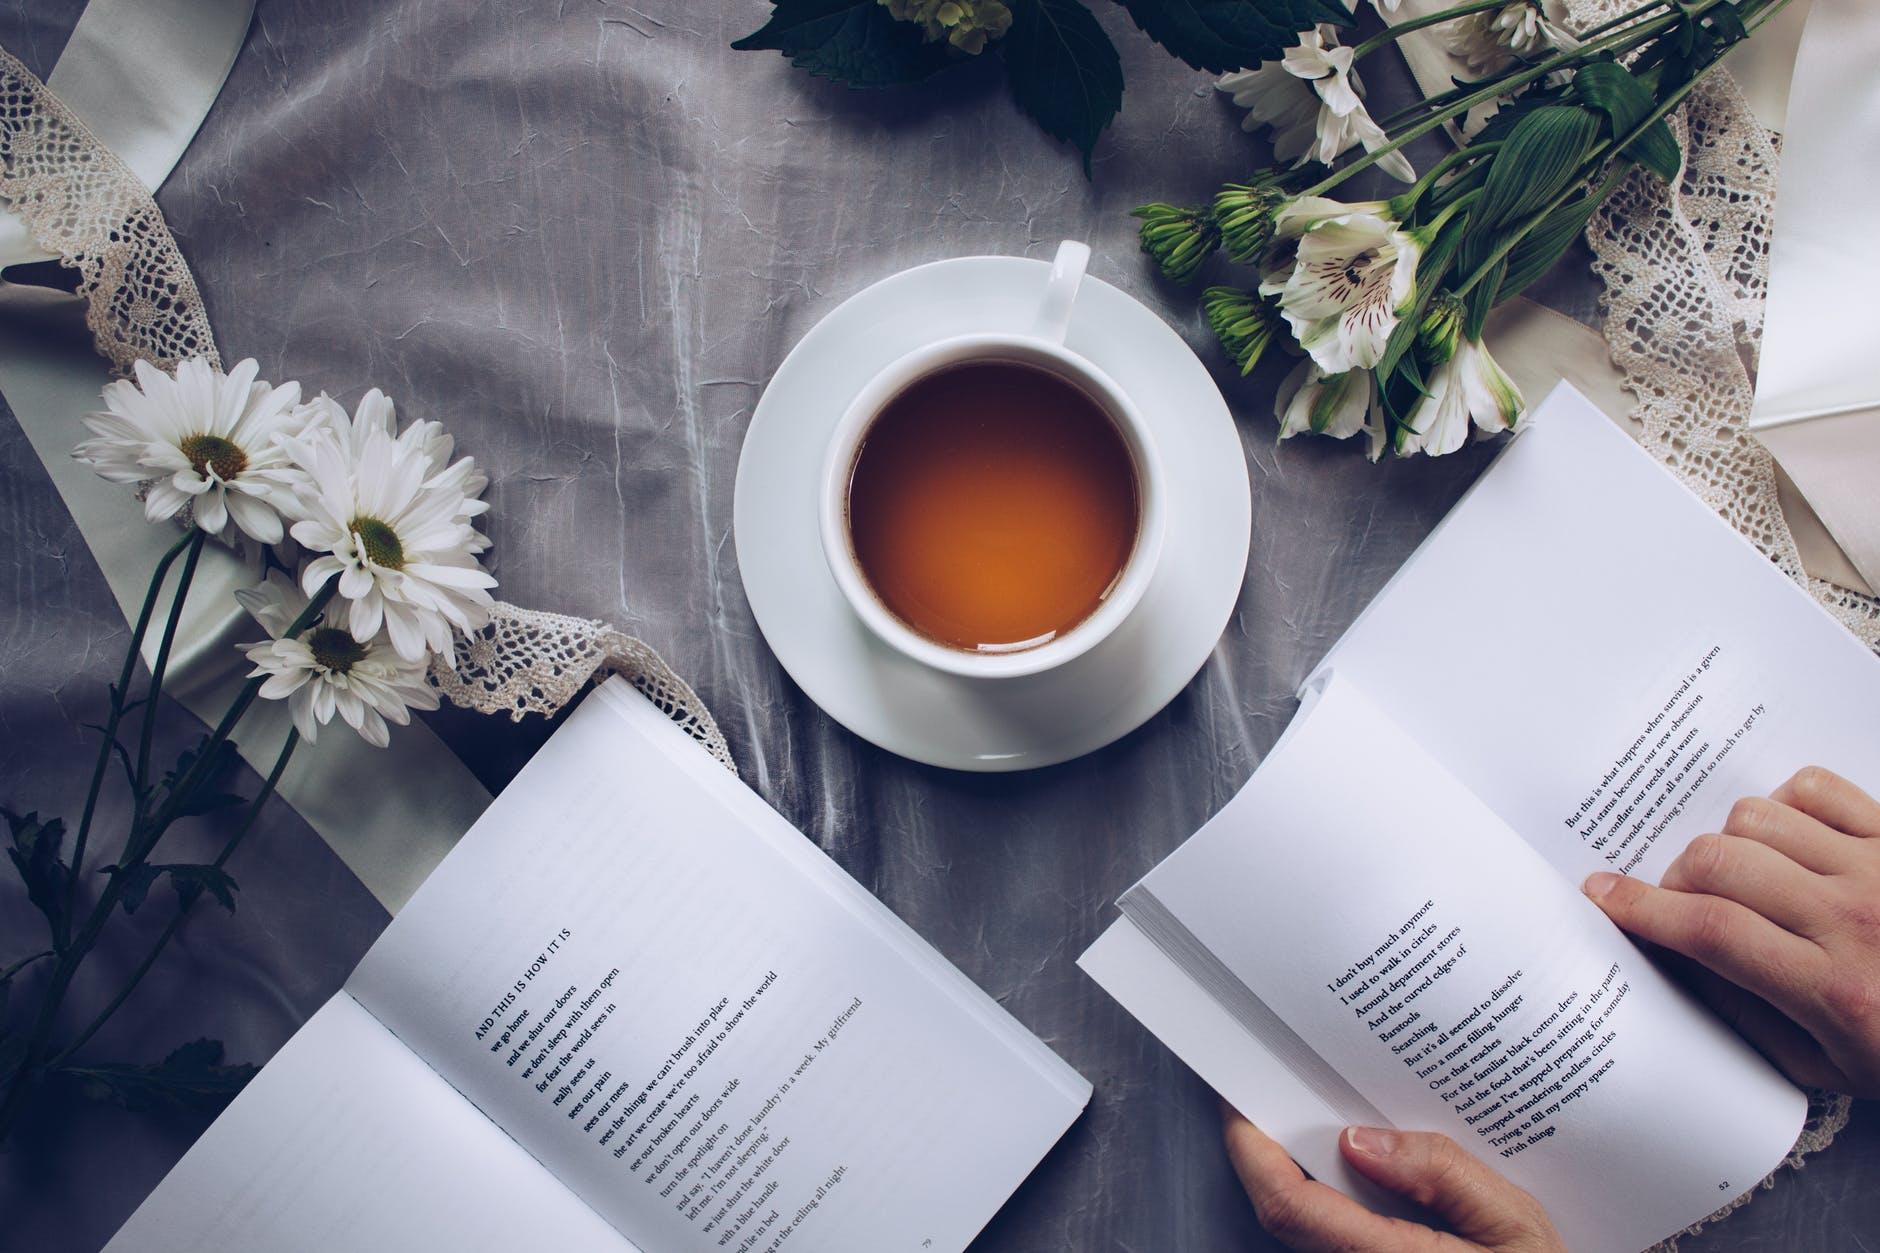 Some Poetry types: Haiku, Tanka, Senryu, Limerick, Sonnet, Ballad, Cinquain